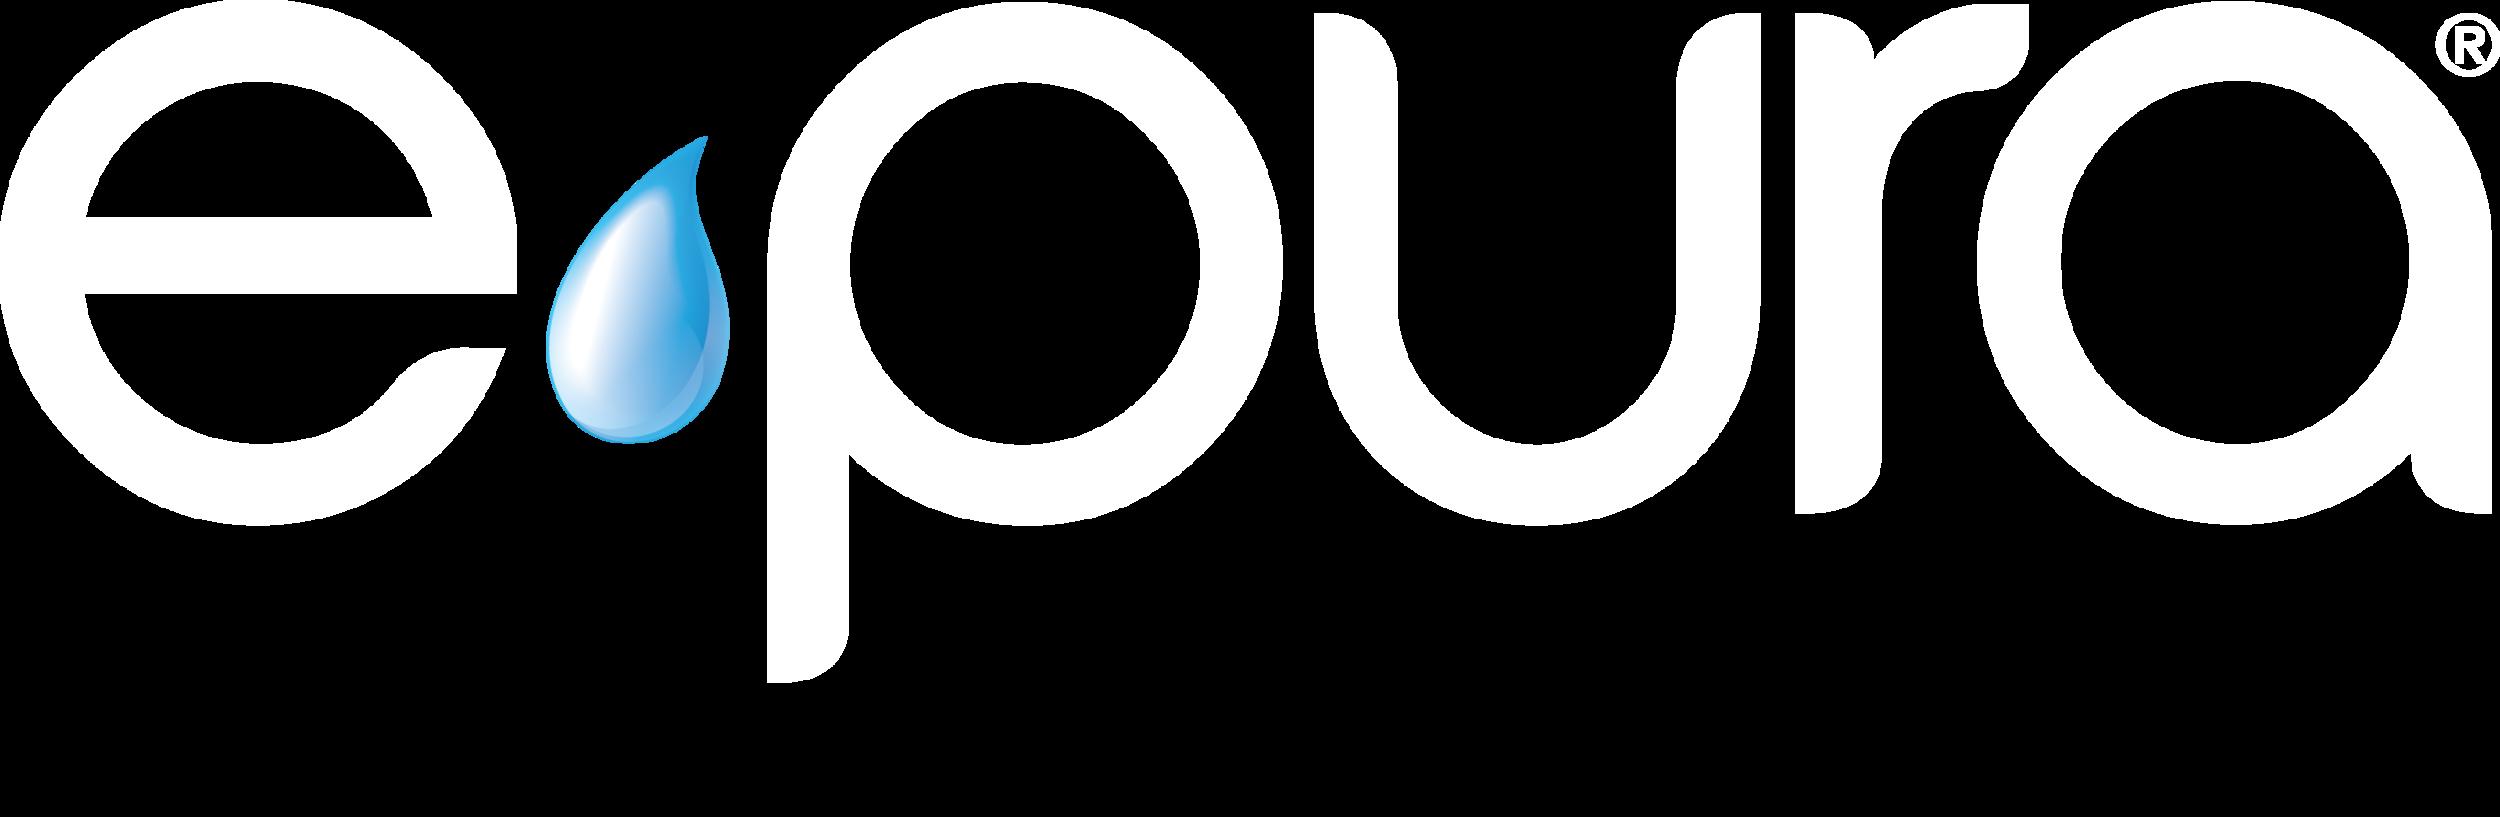 logo_epura_2014_sinleyenda_BLANCO - copia.png